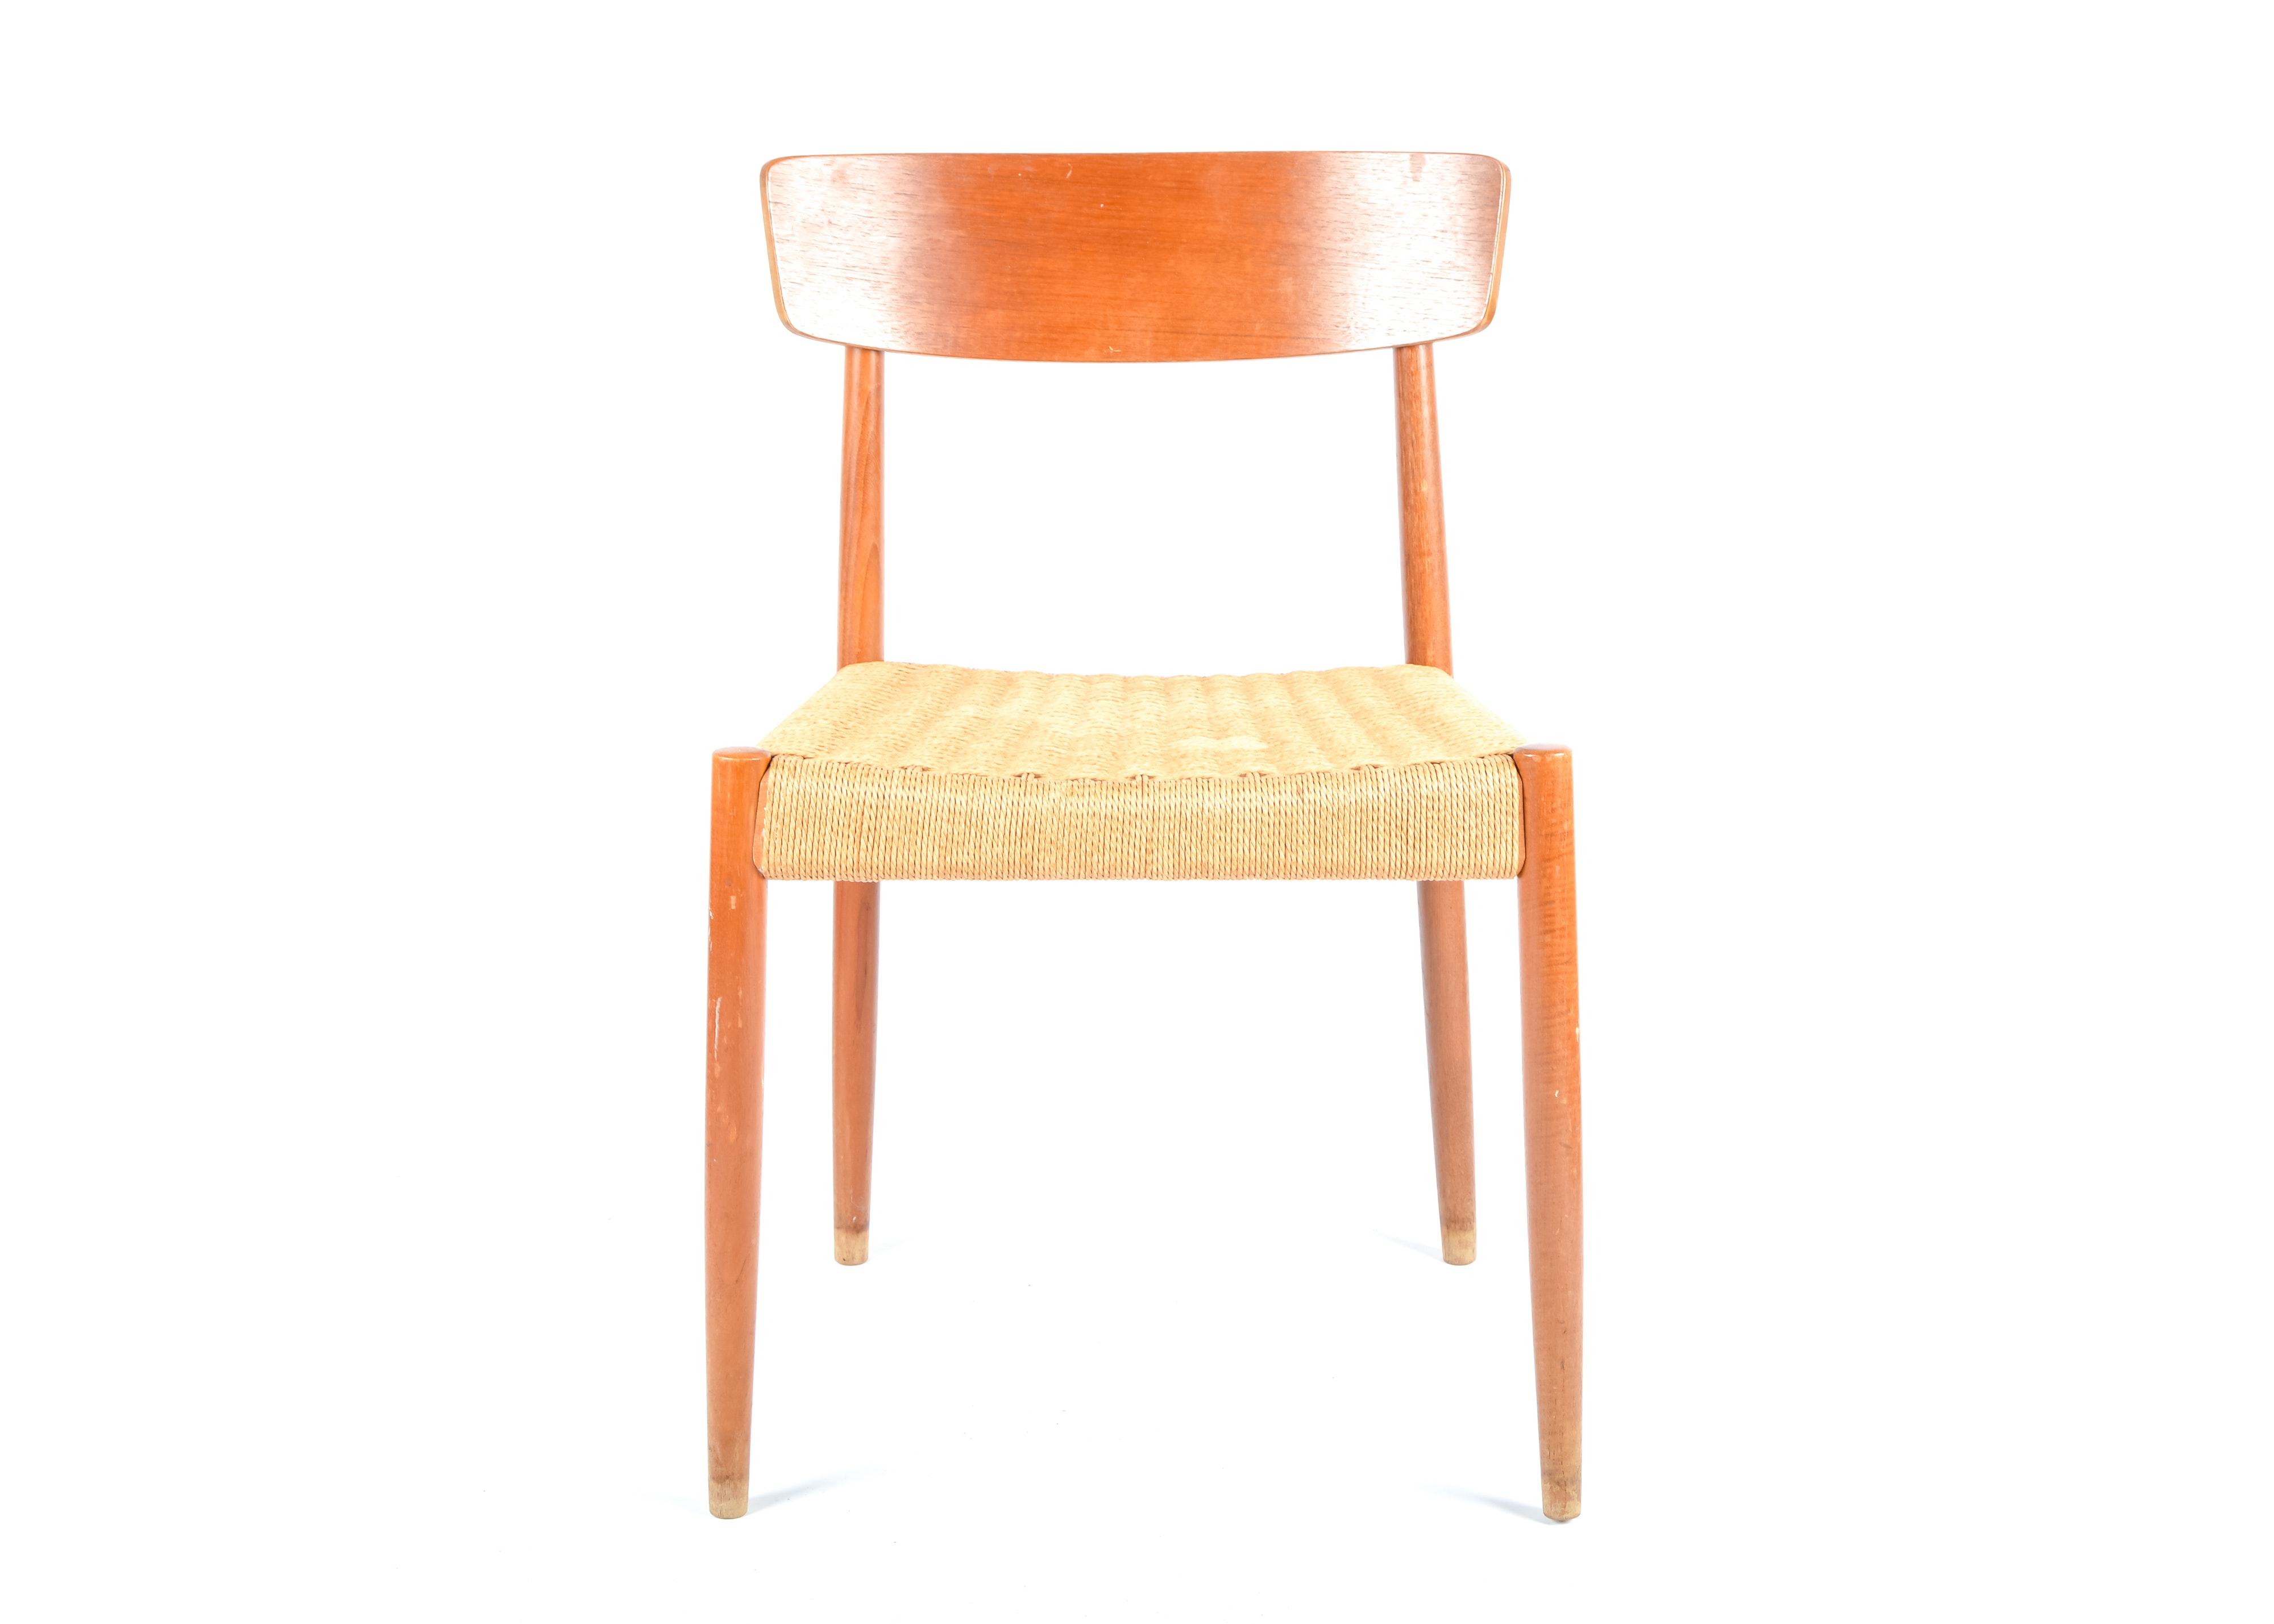 Attirant Vintage Danish Modern Teak And Cord Side Chair